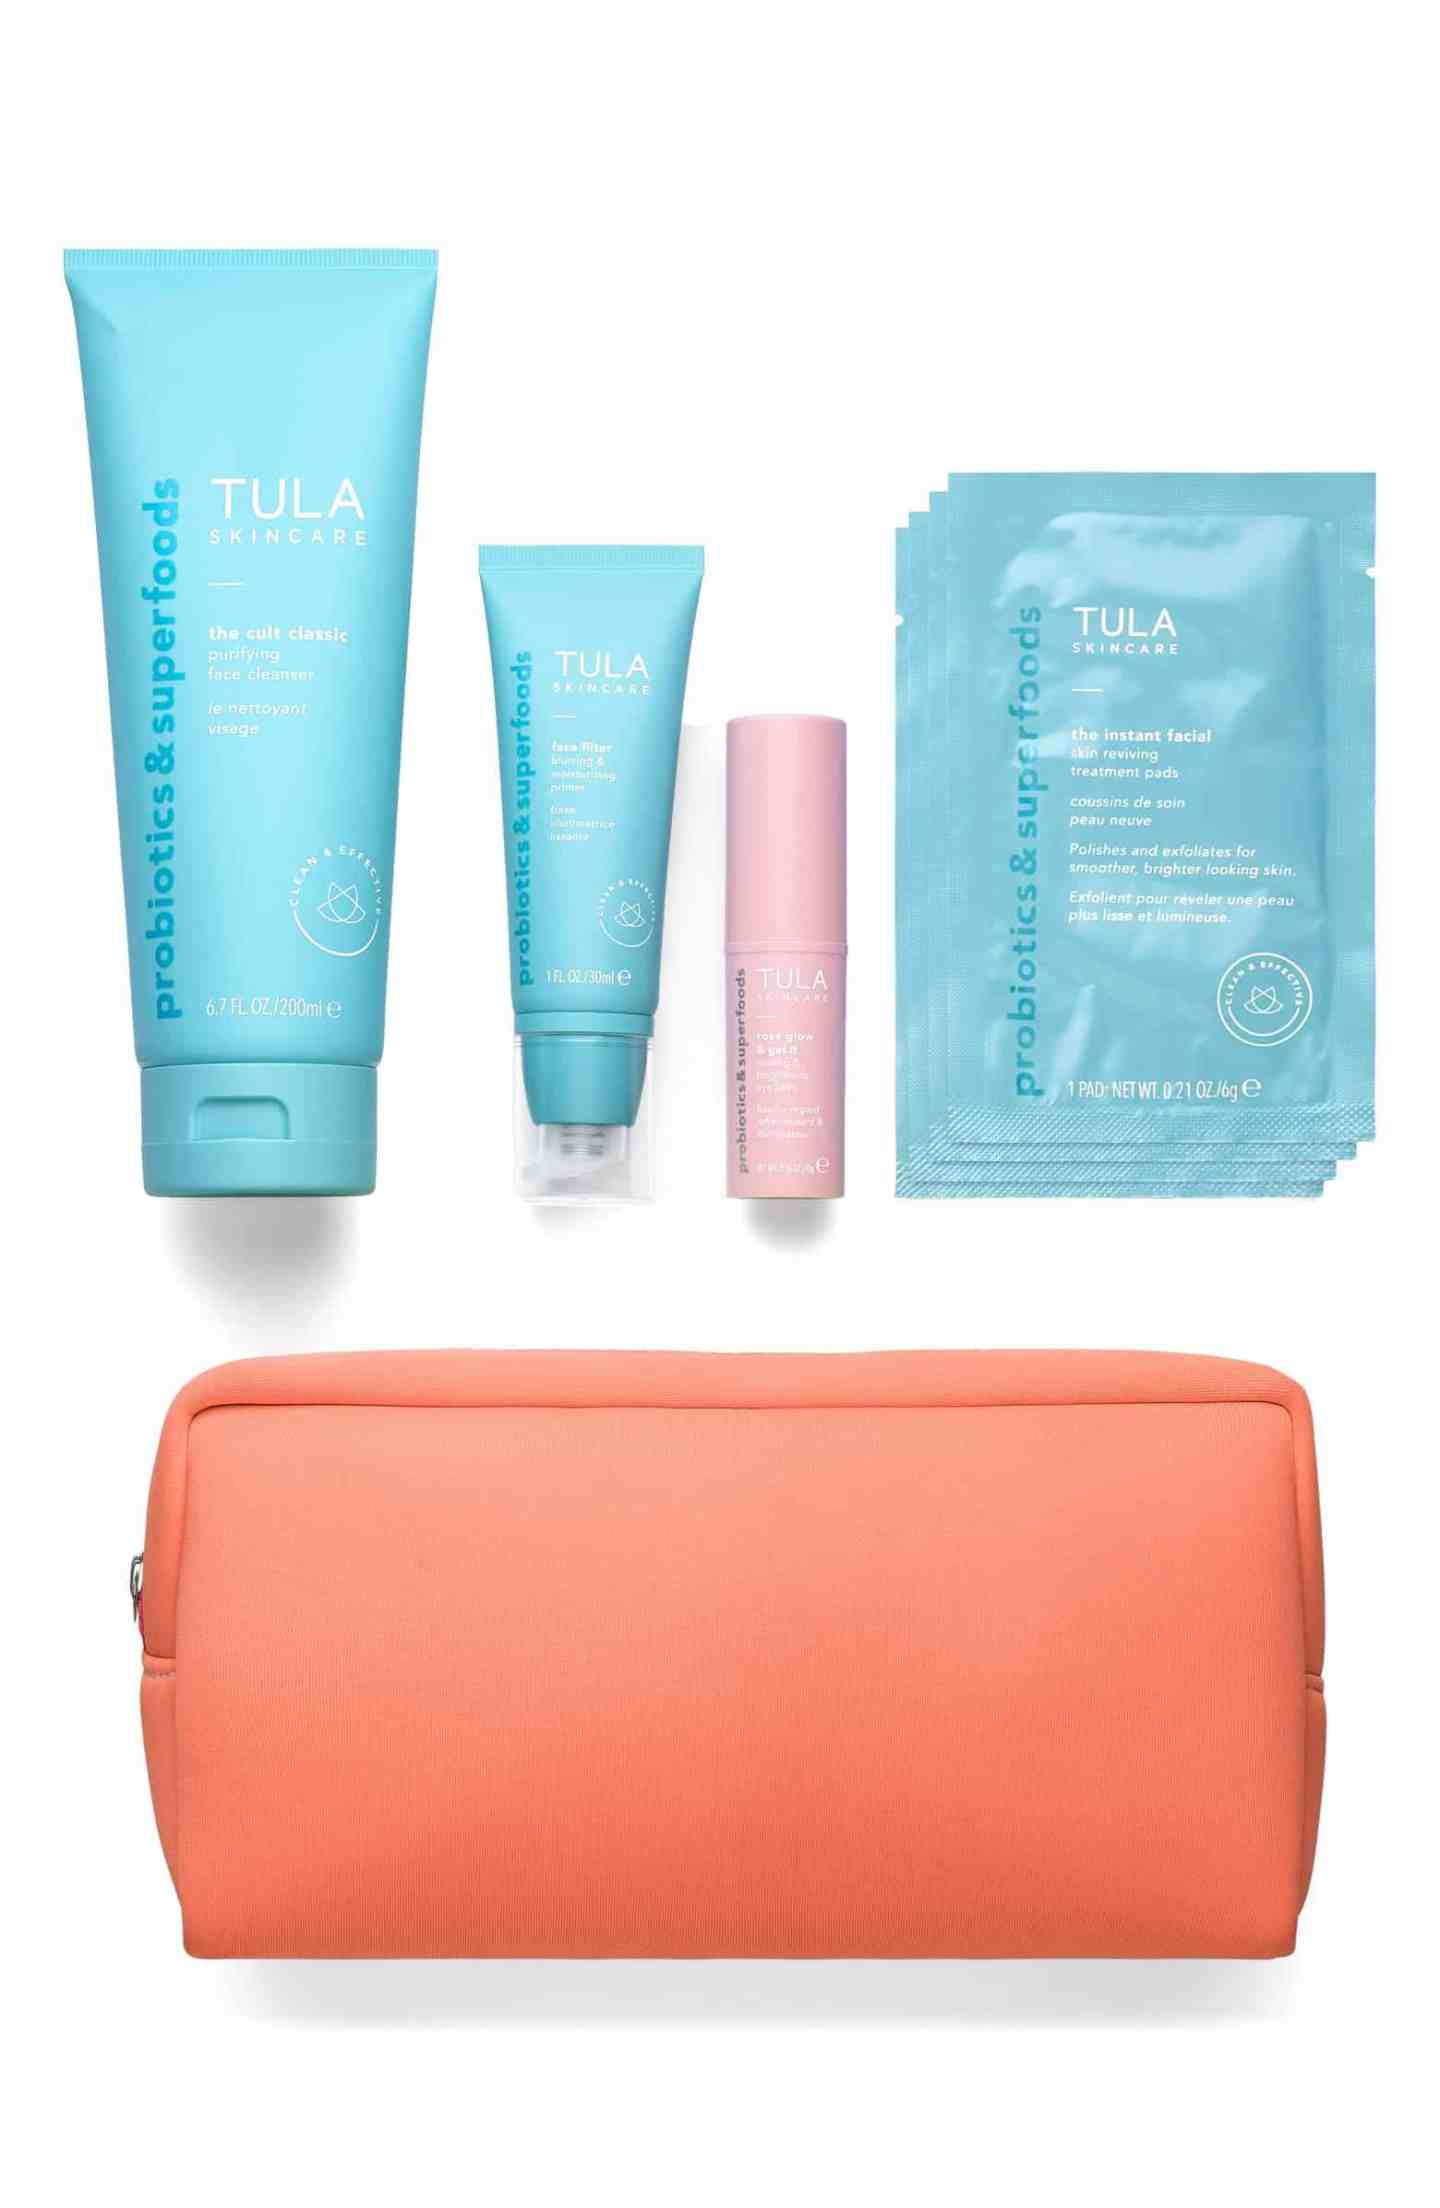 Tula-Ready-Set-Glow-No-Filter-Skin-Care-Set